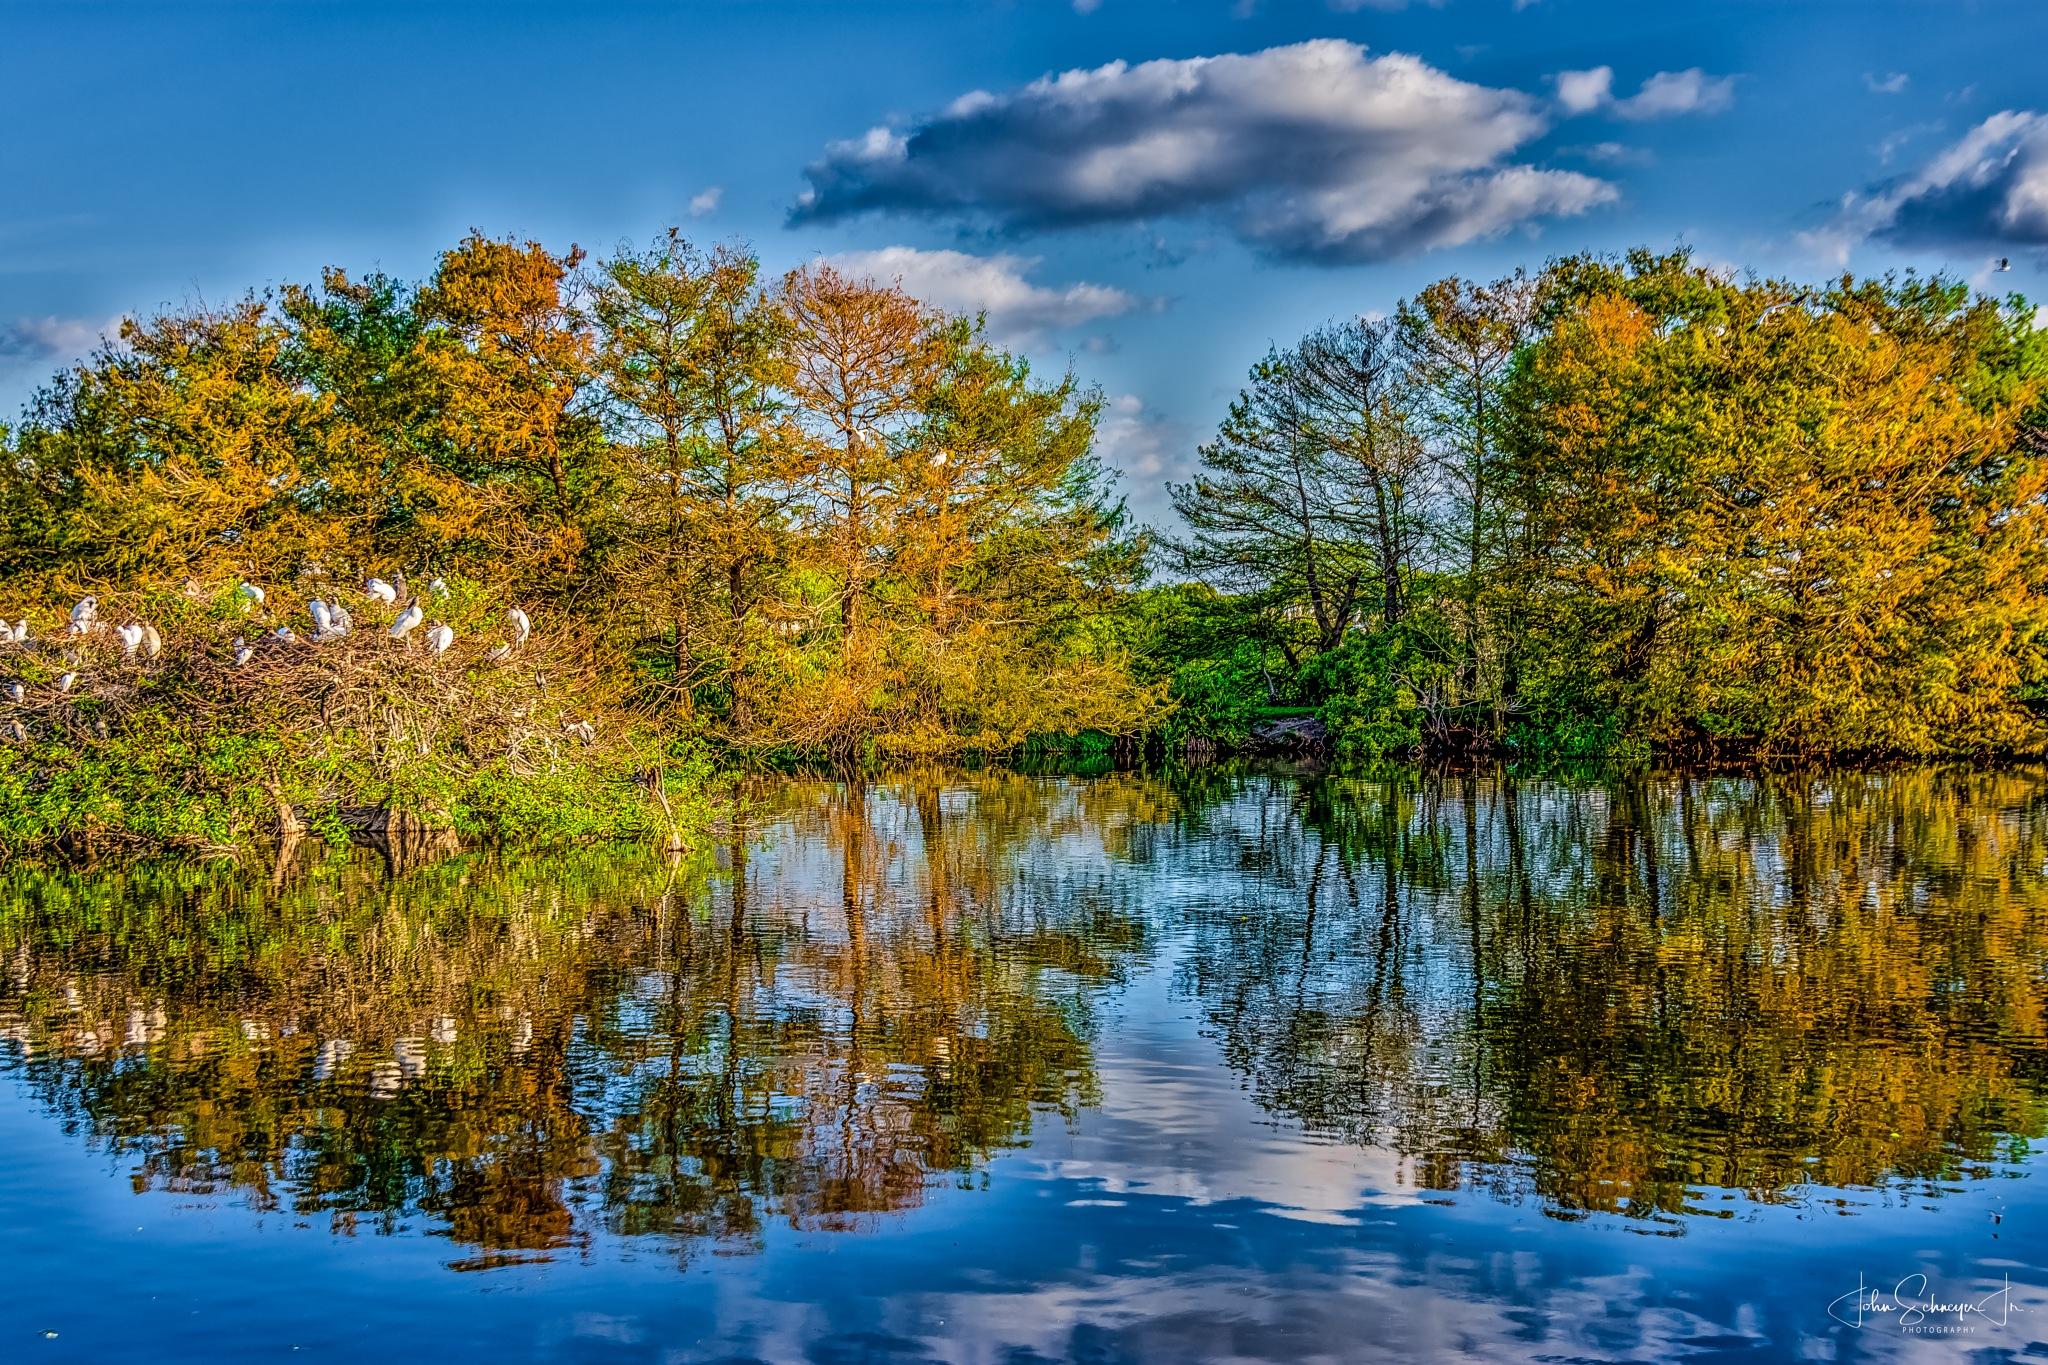 Wetlands Reflections by John Schneyer